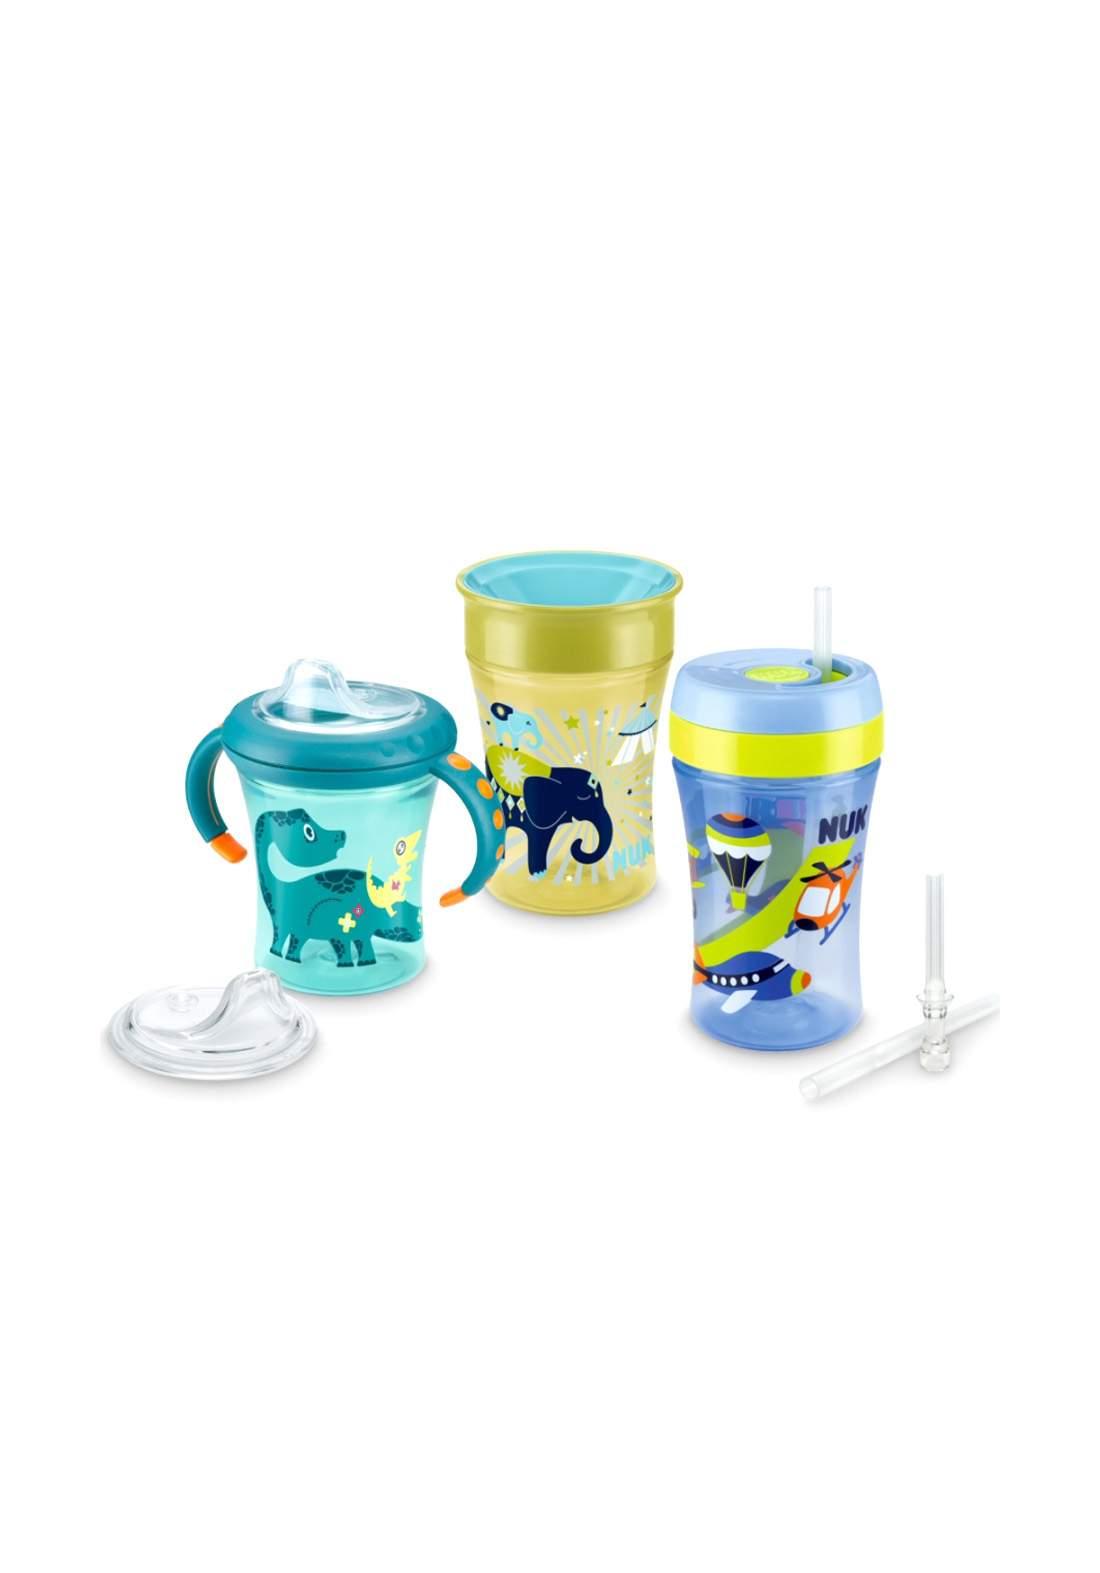 Nuk Learn to drink Set سيت أكواب للأطفال